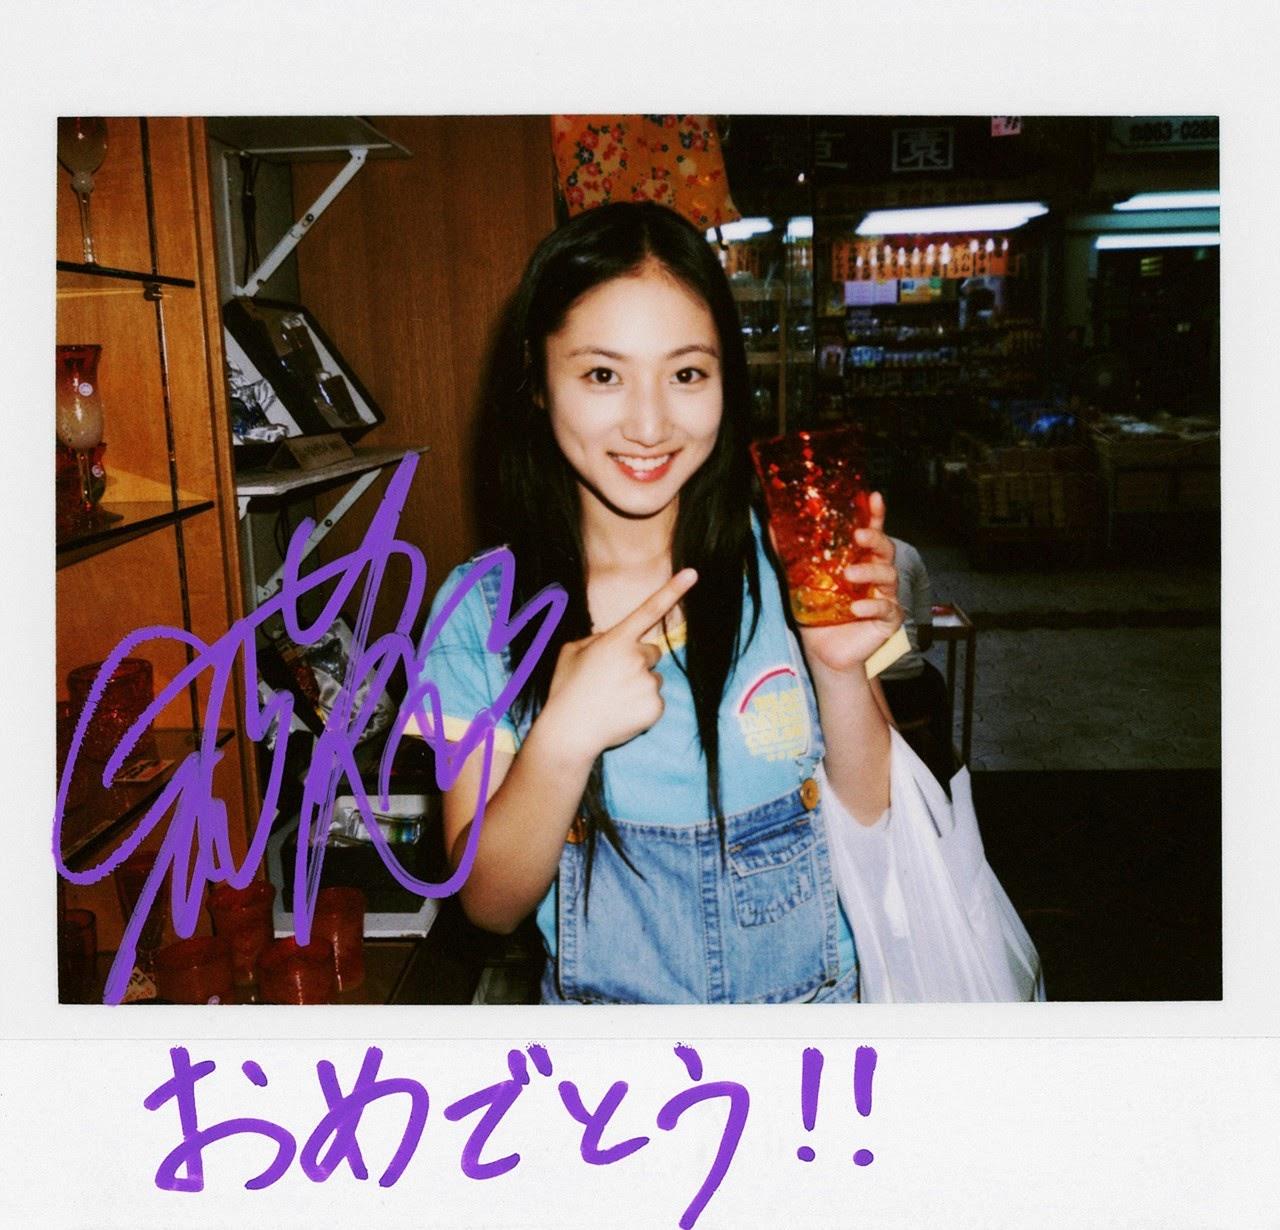 And on Kumejima the first experienceher late summer vacation begins! Saaya165